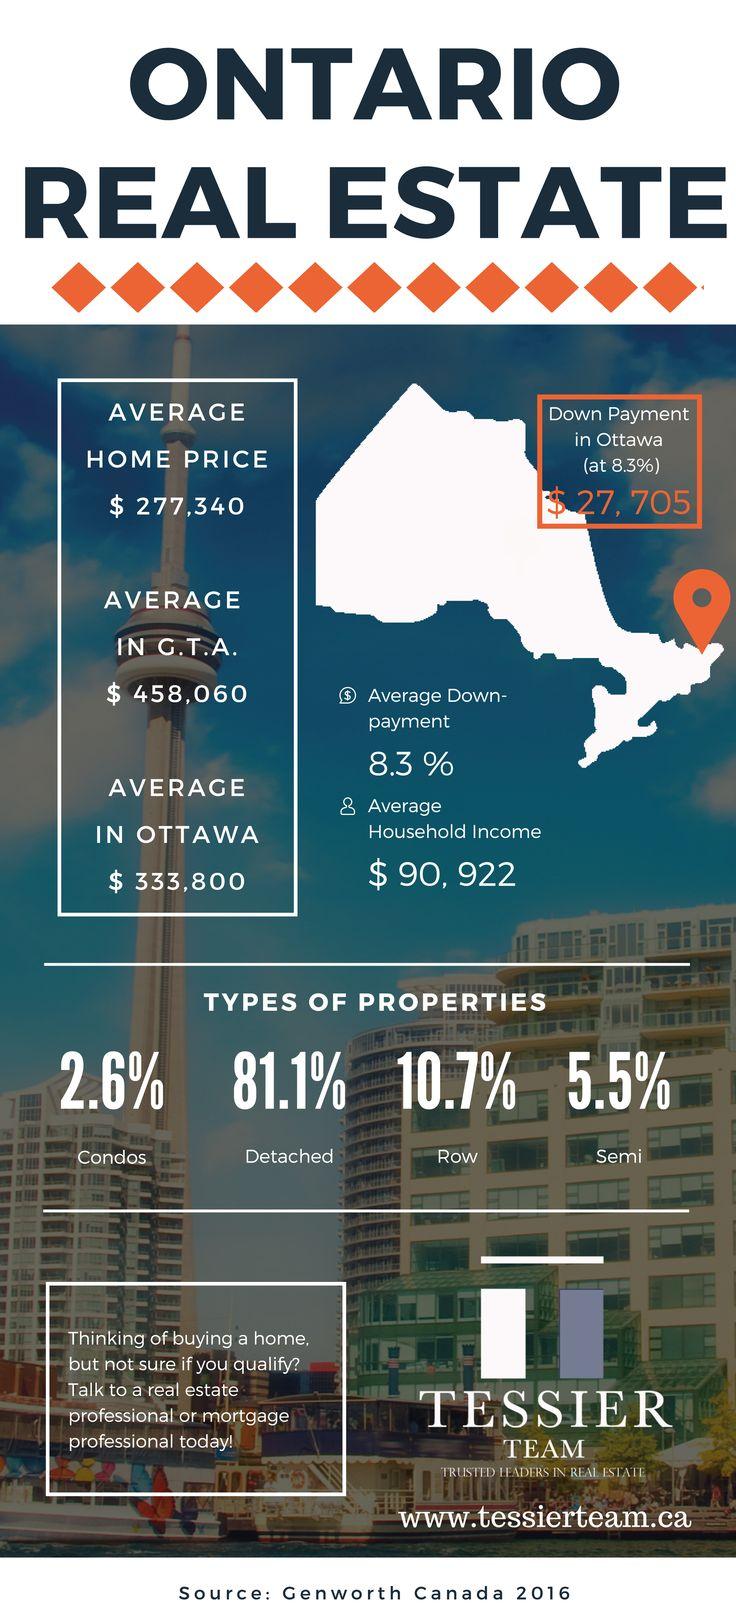 #Ontario #realestate #stats #tessierteam